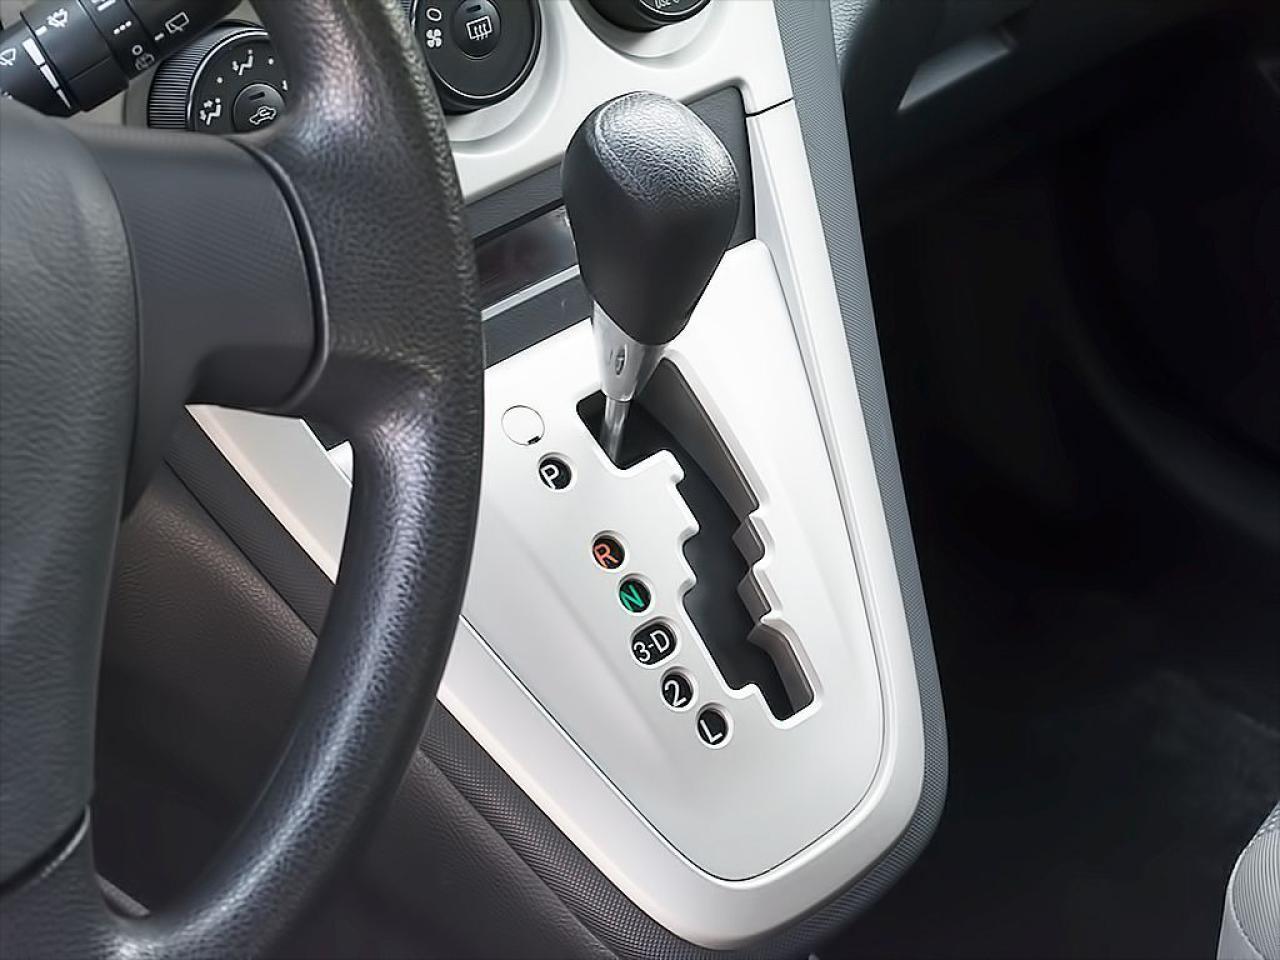 2010 Toyota Matrix AWD|AUTOMATIC|ROOF RACK